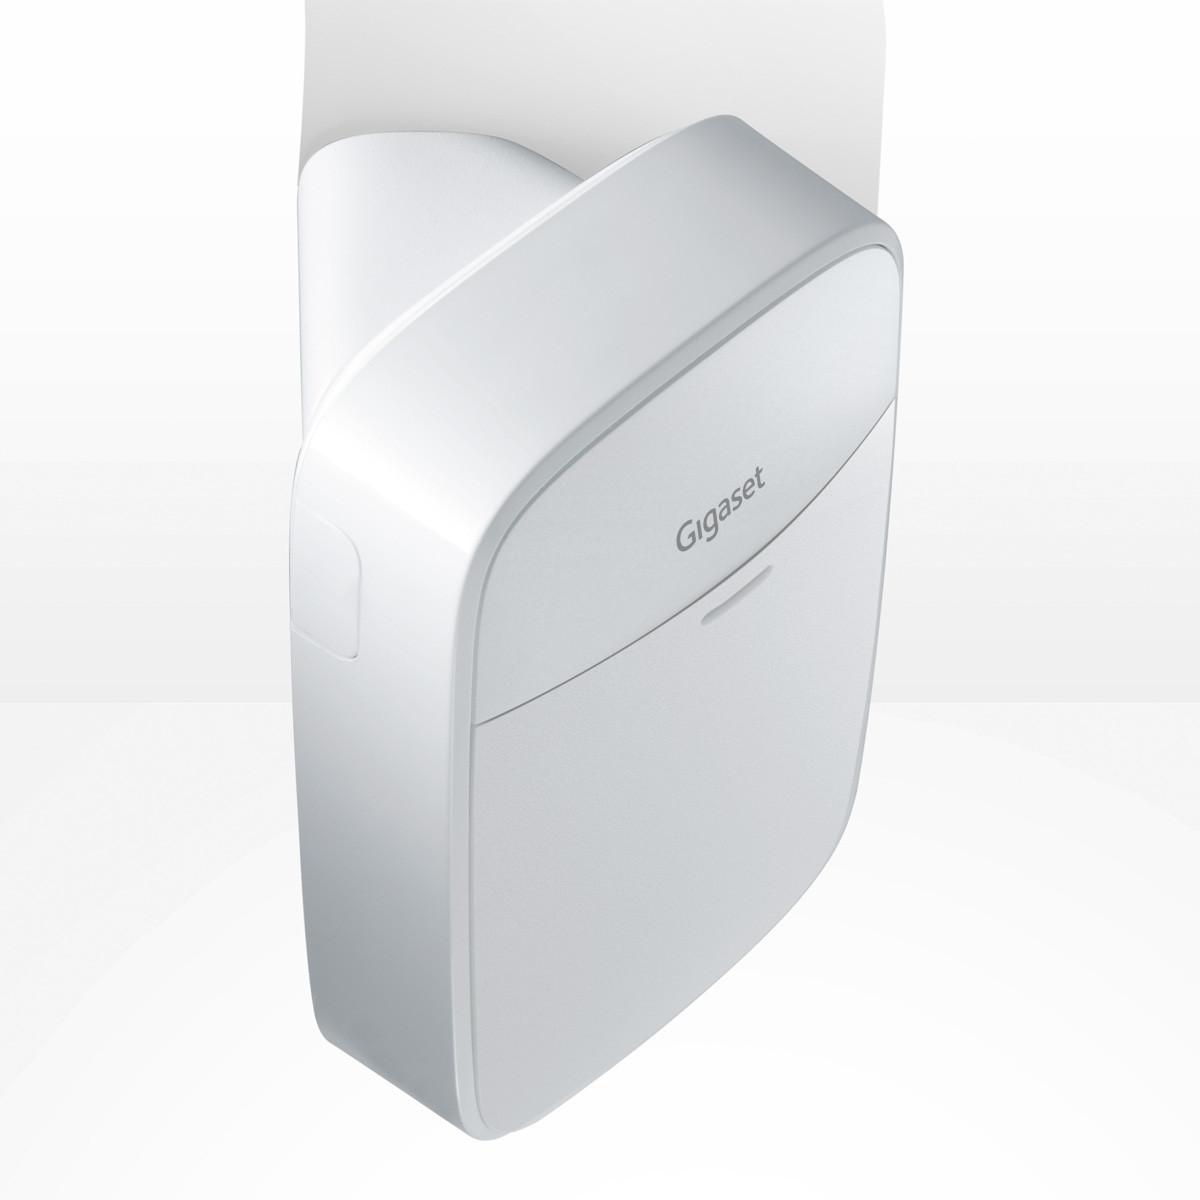 Gigaset Motion Sensor ONE X